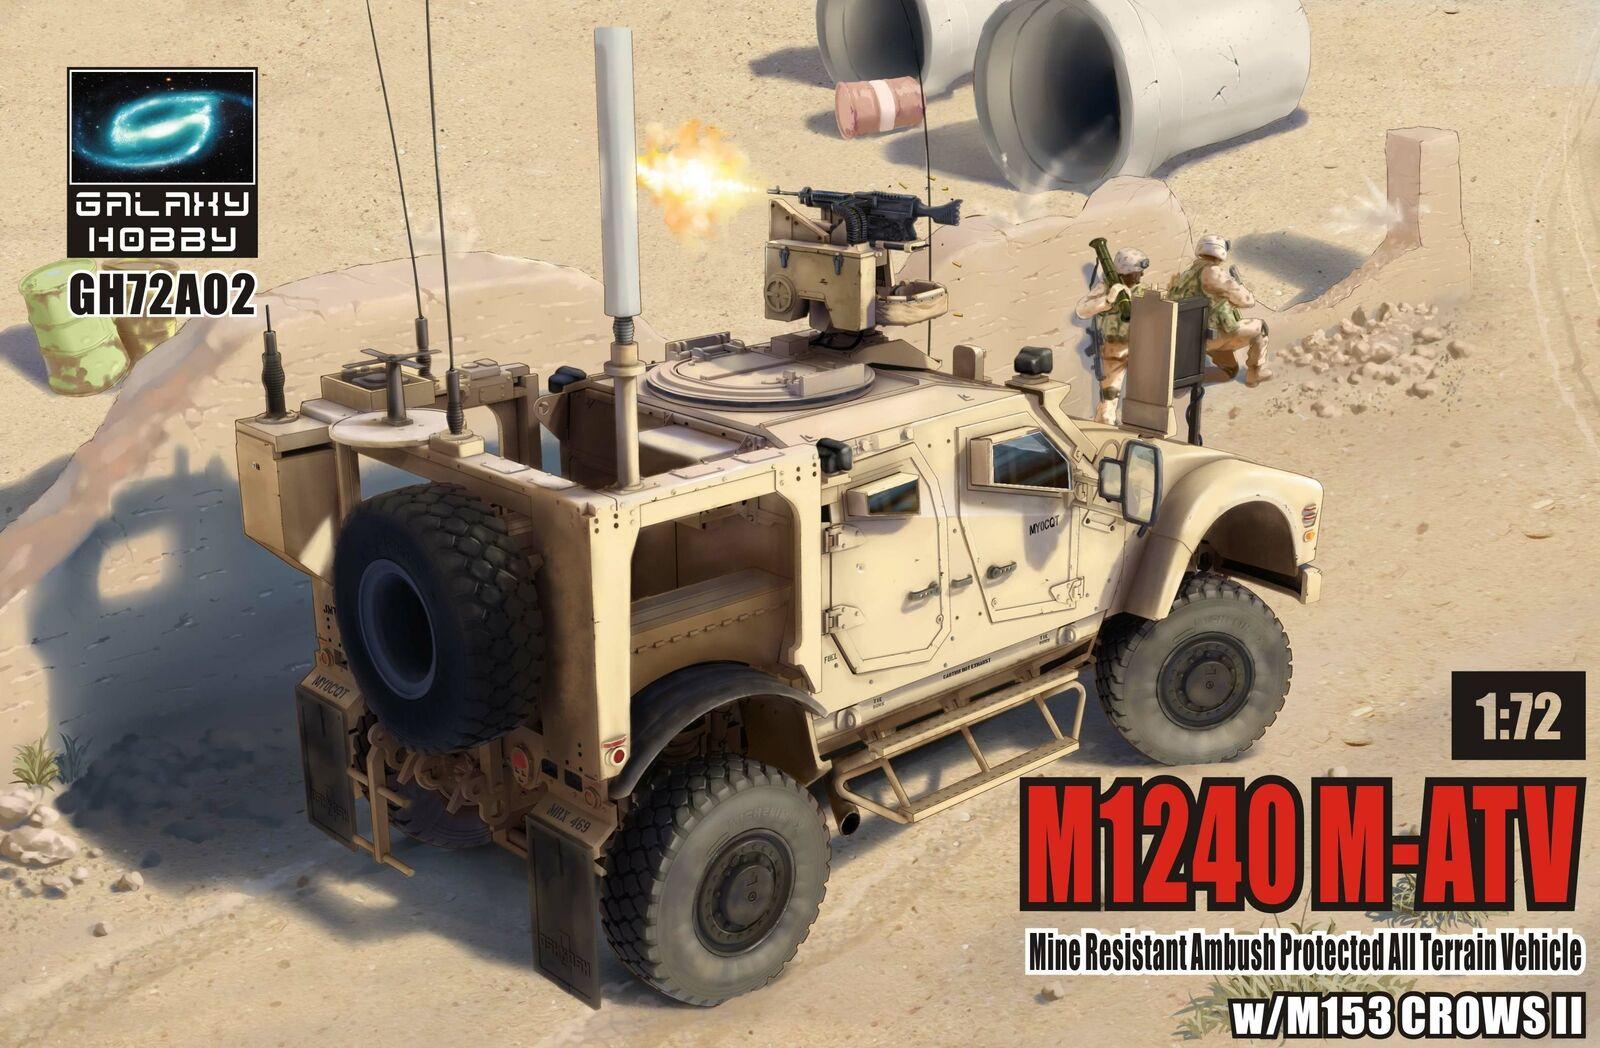 Galaxy Hobby 1/72 M1240 M-ATV MRAP All Terrain Vehicle w/ M153 CROWS II